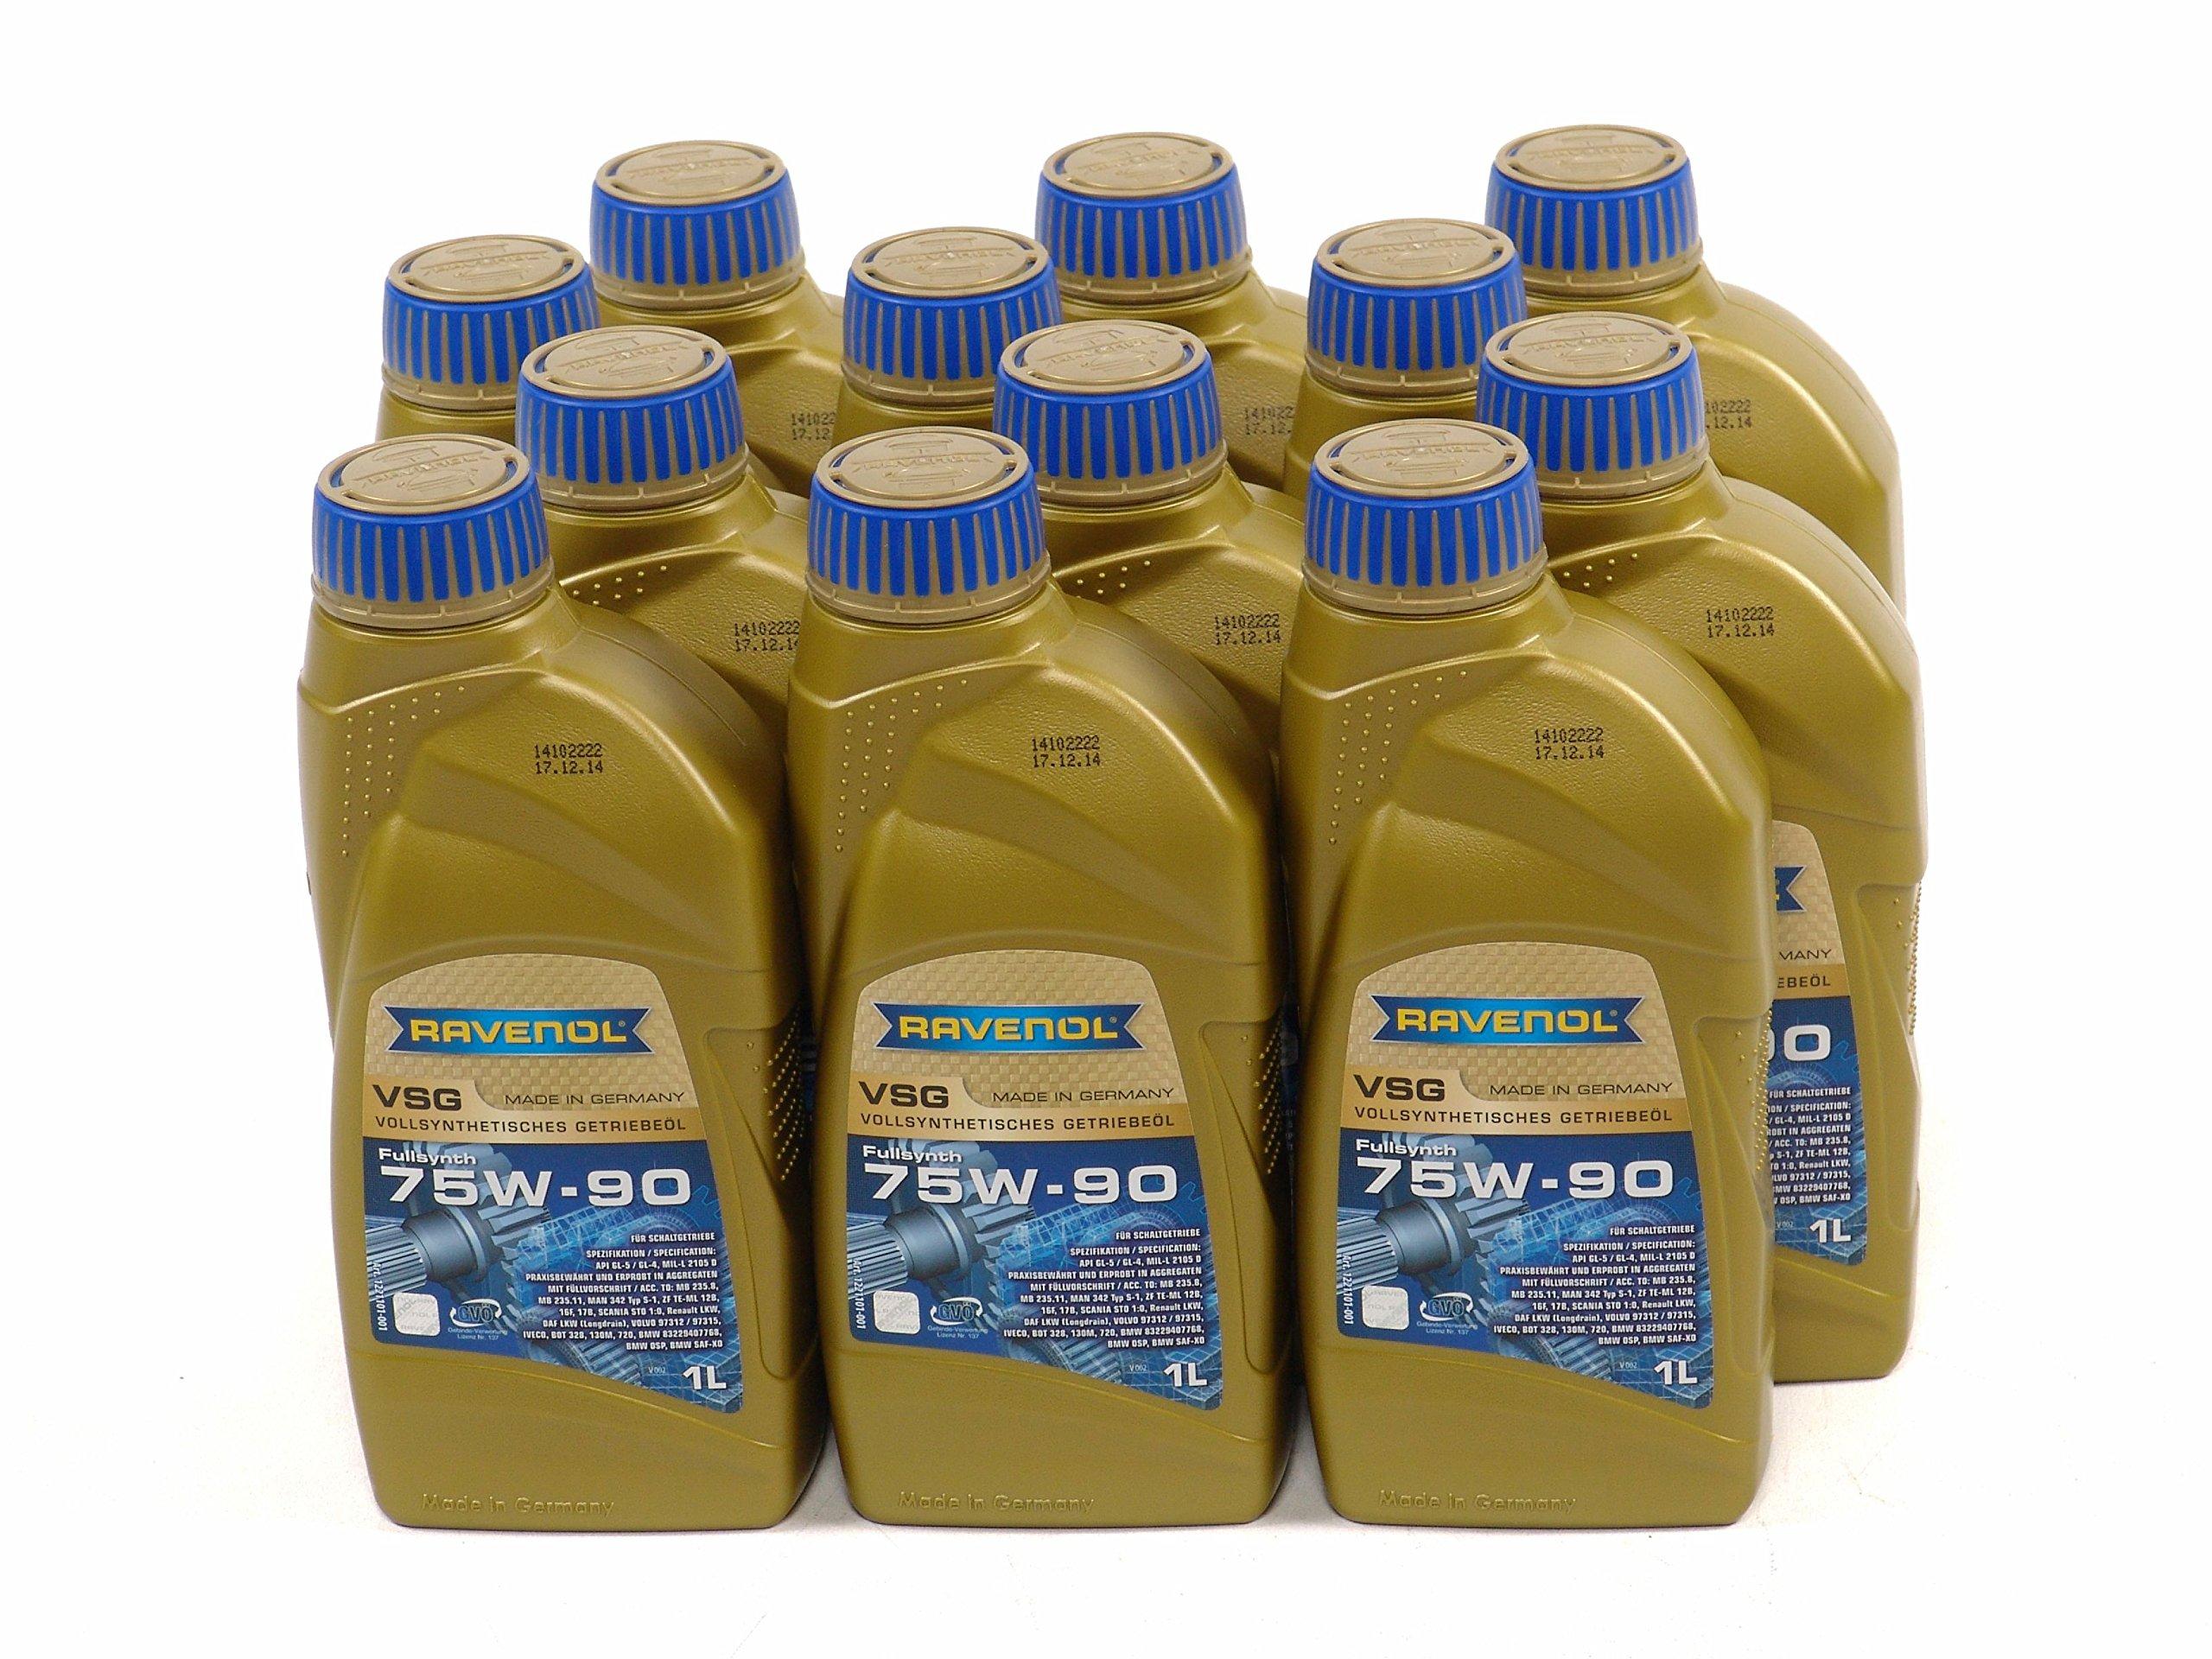 RAVENOL J1C1109-12 SAE 75W-90 Gear Oil - VSG Full Synthetic API GL-4 / GL-5 Spec (1L, Case of 12) by Ravenol